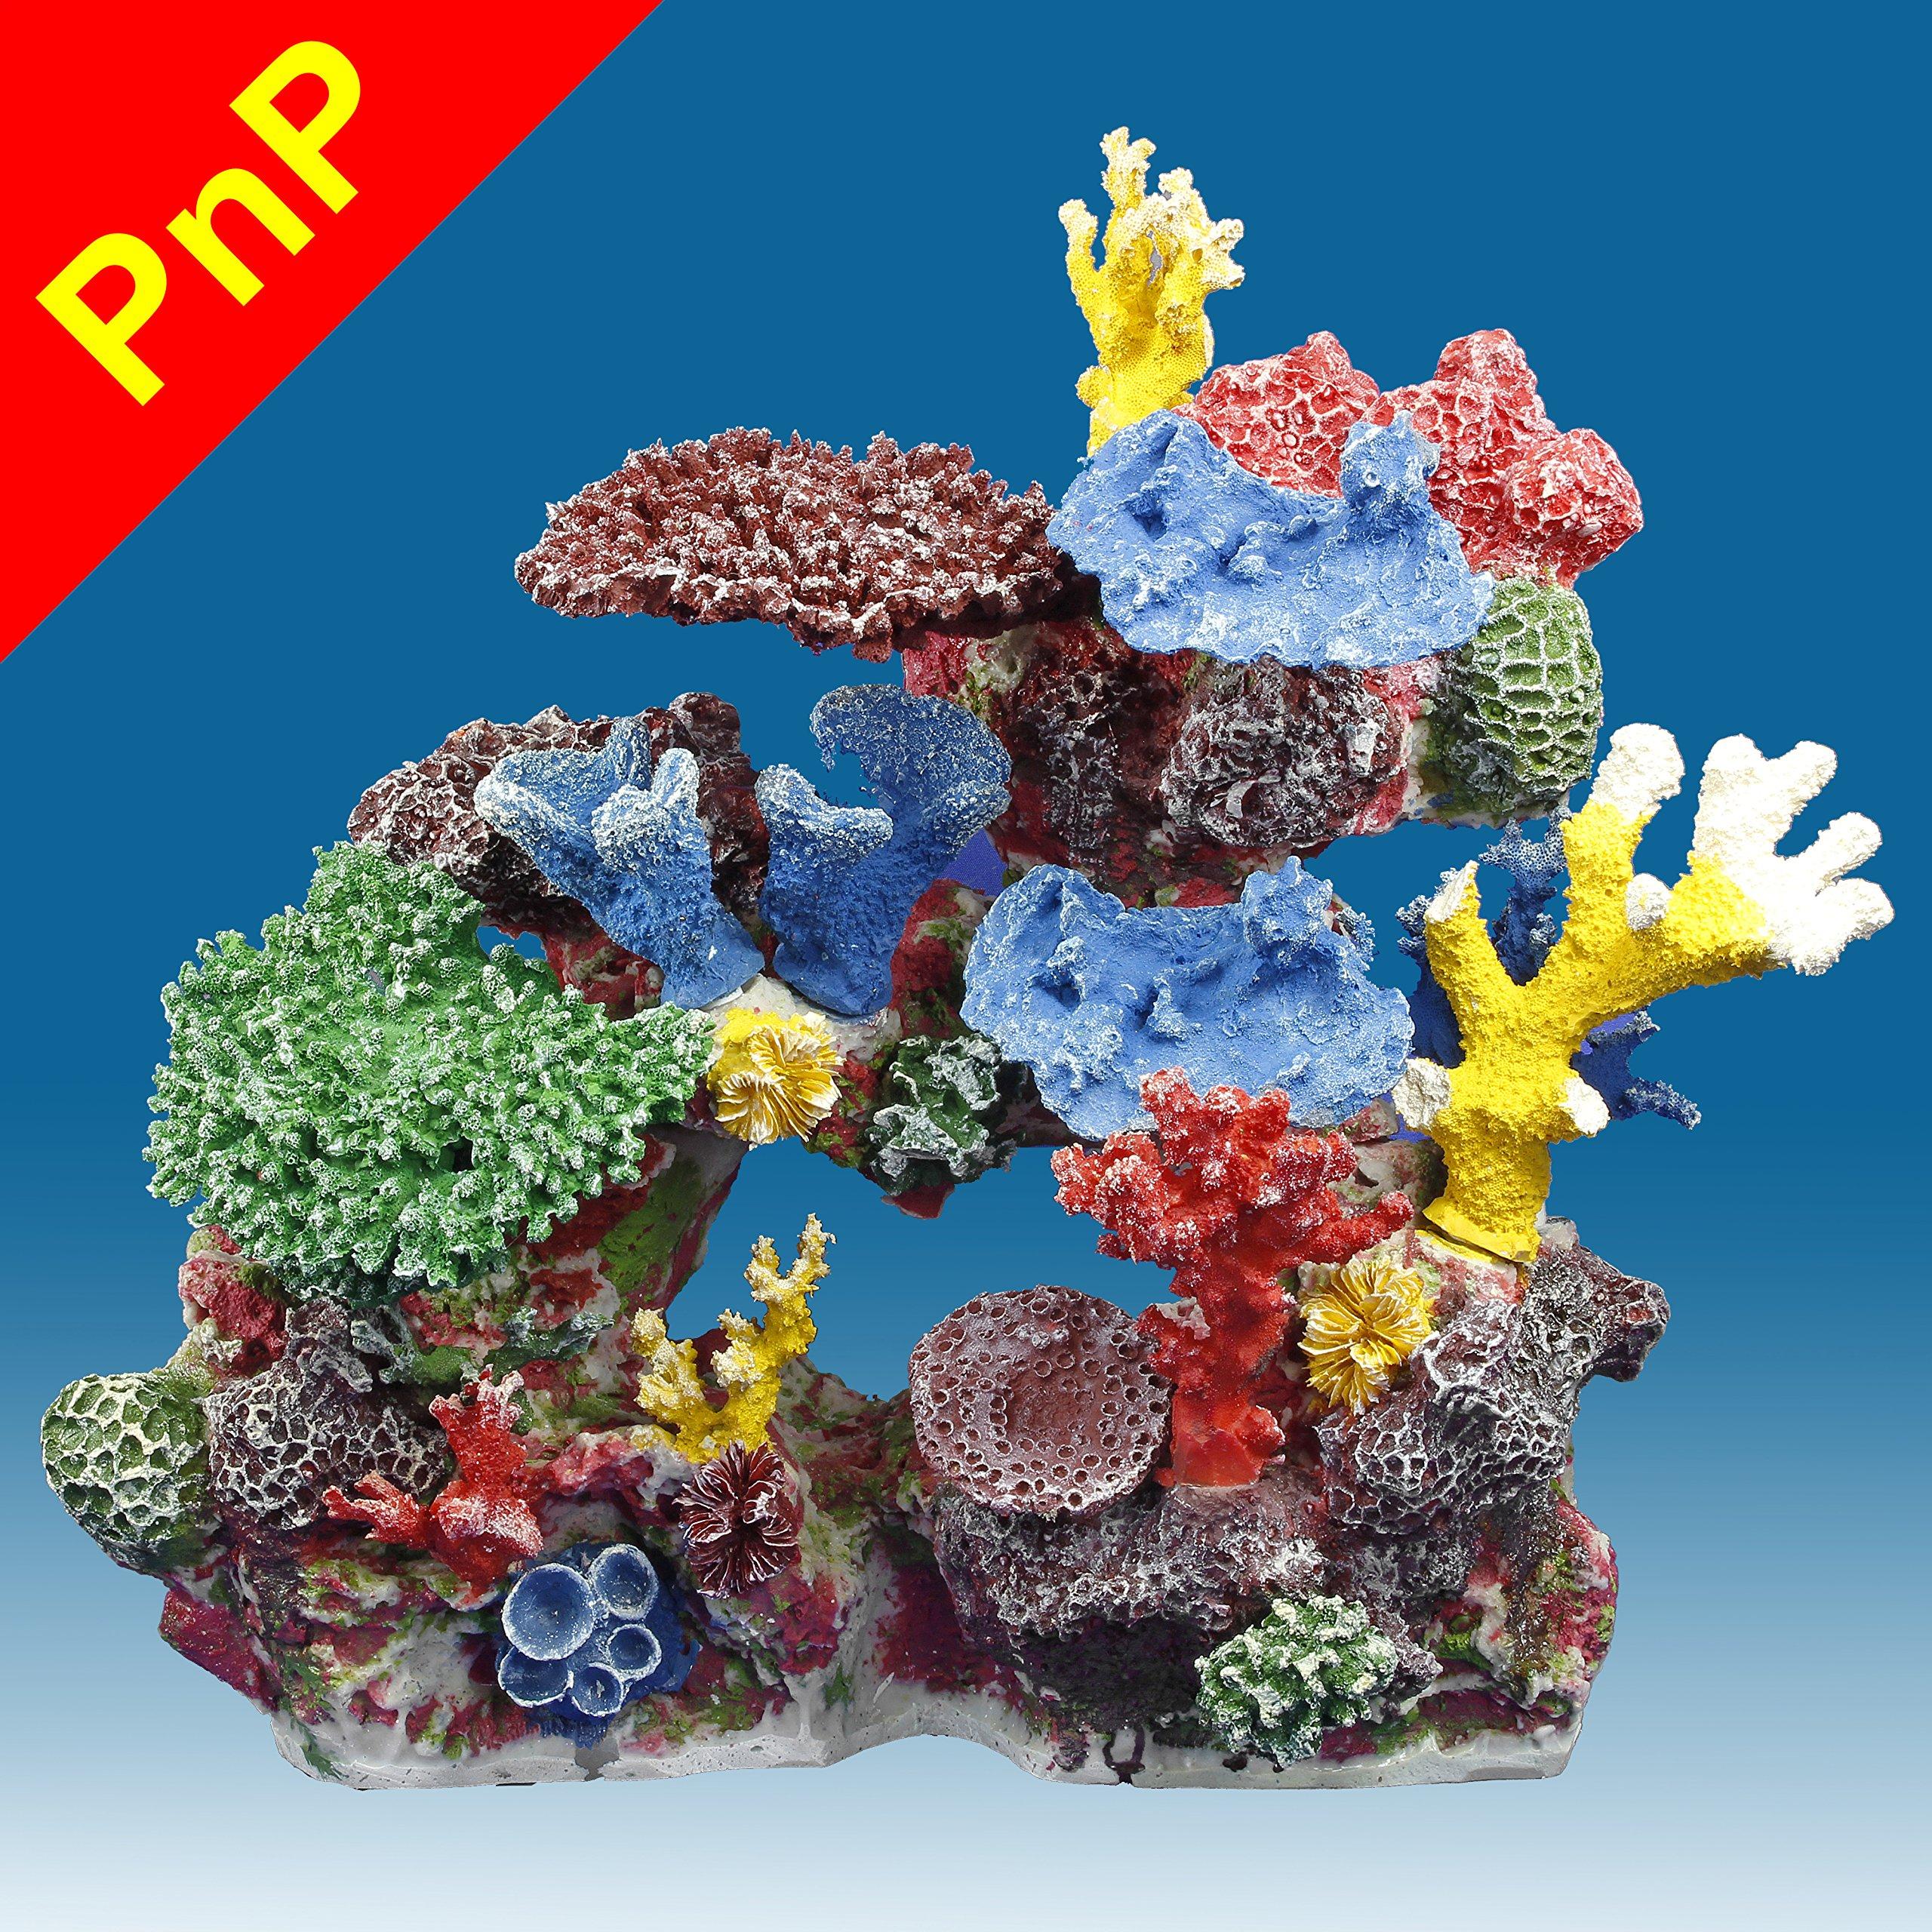 Instant Reef DM032PNP Artificial Coral Reef Aquarium Decor for Saltwater Fish, Marine Fish Tanks and Freshwater Fish Aquariums